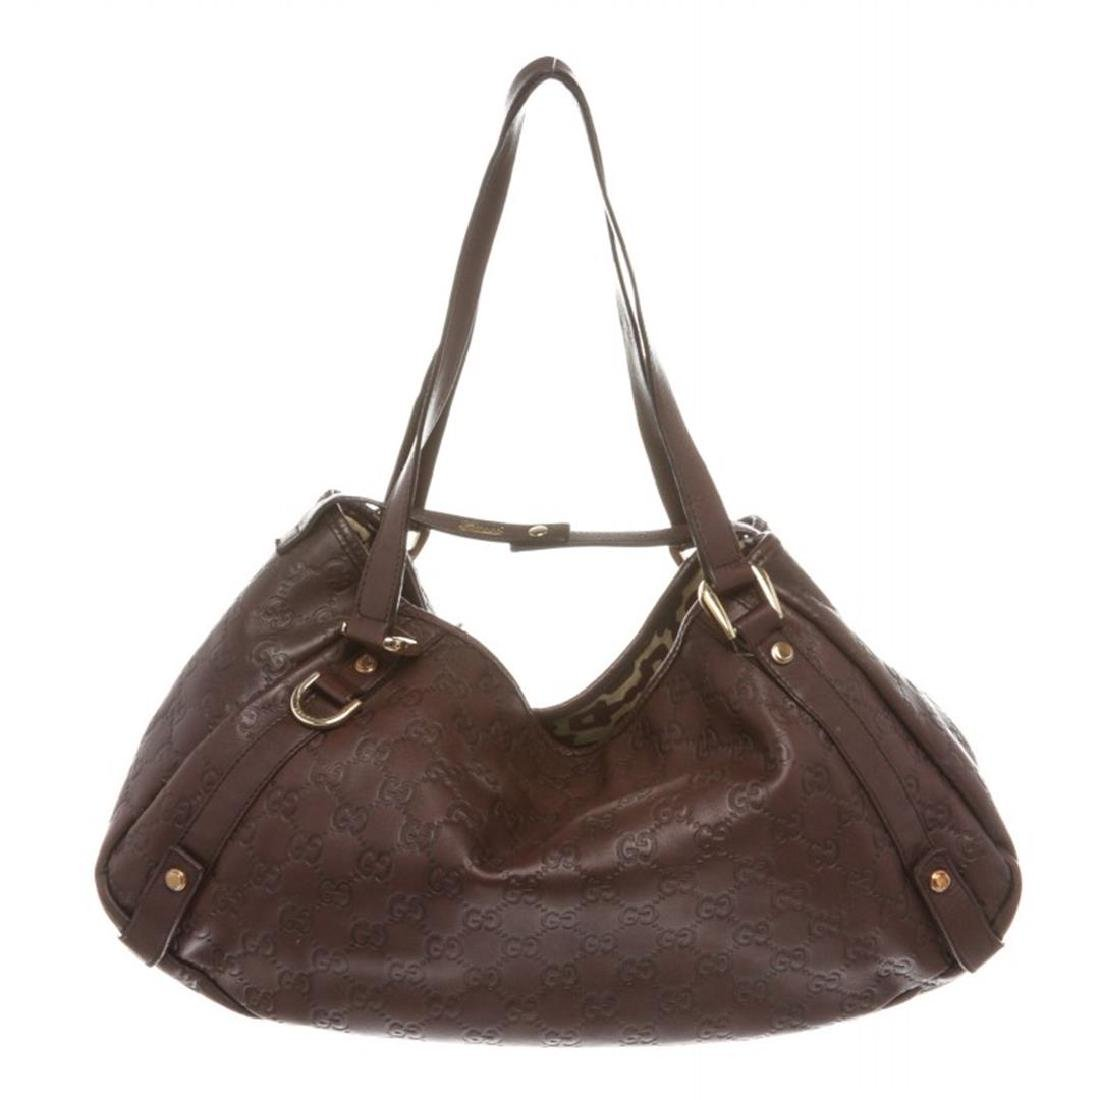 Gucci Burgundy Leather Guccissima Abbey Medium Tote Bag